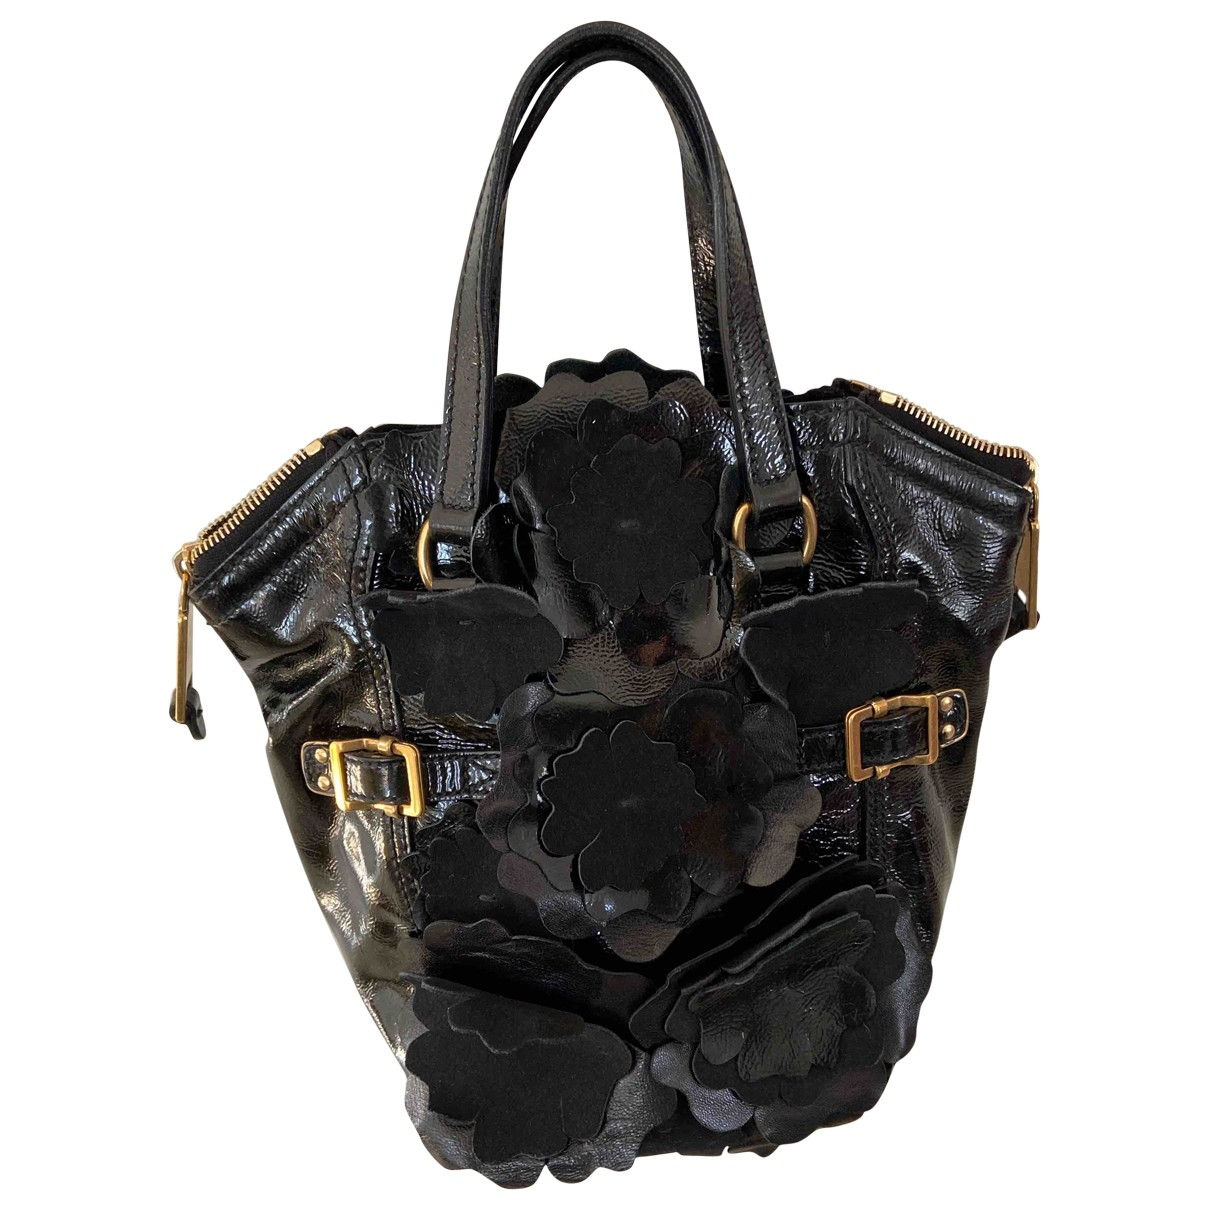 Yves Saint Laurent Downtown Handtasche in  Schwarz Lackleder